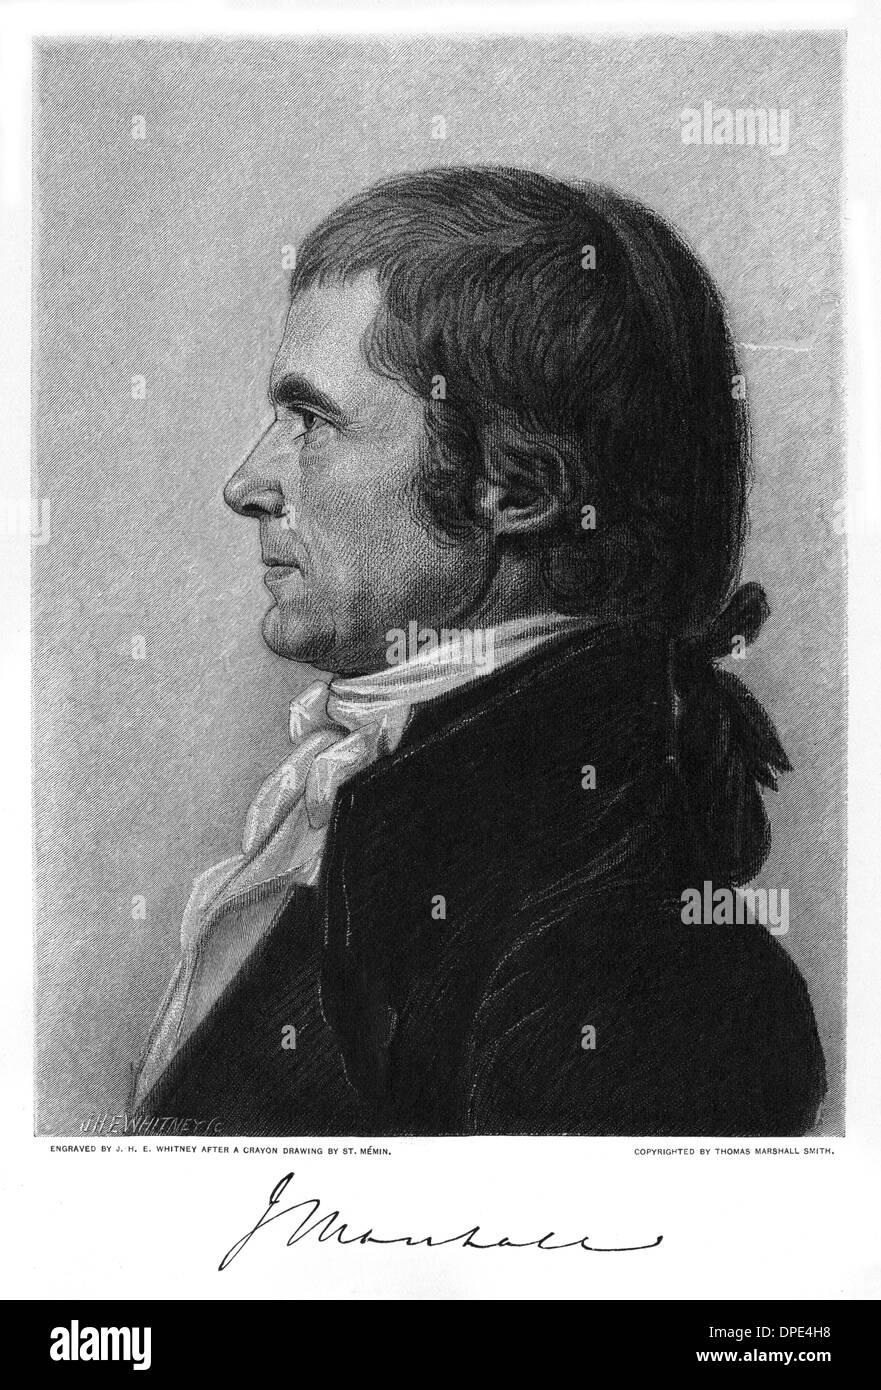 JOHN MARSHALL - 3 - Stock Image